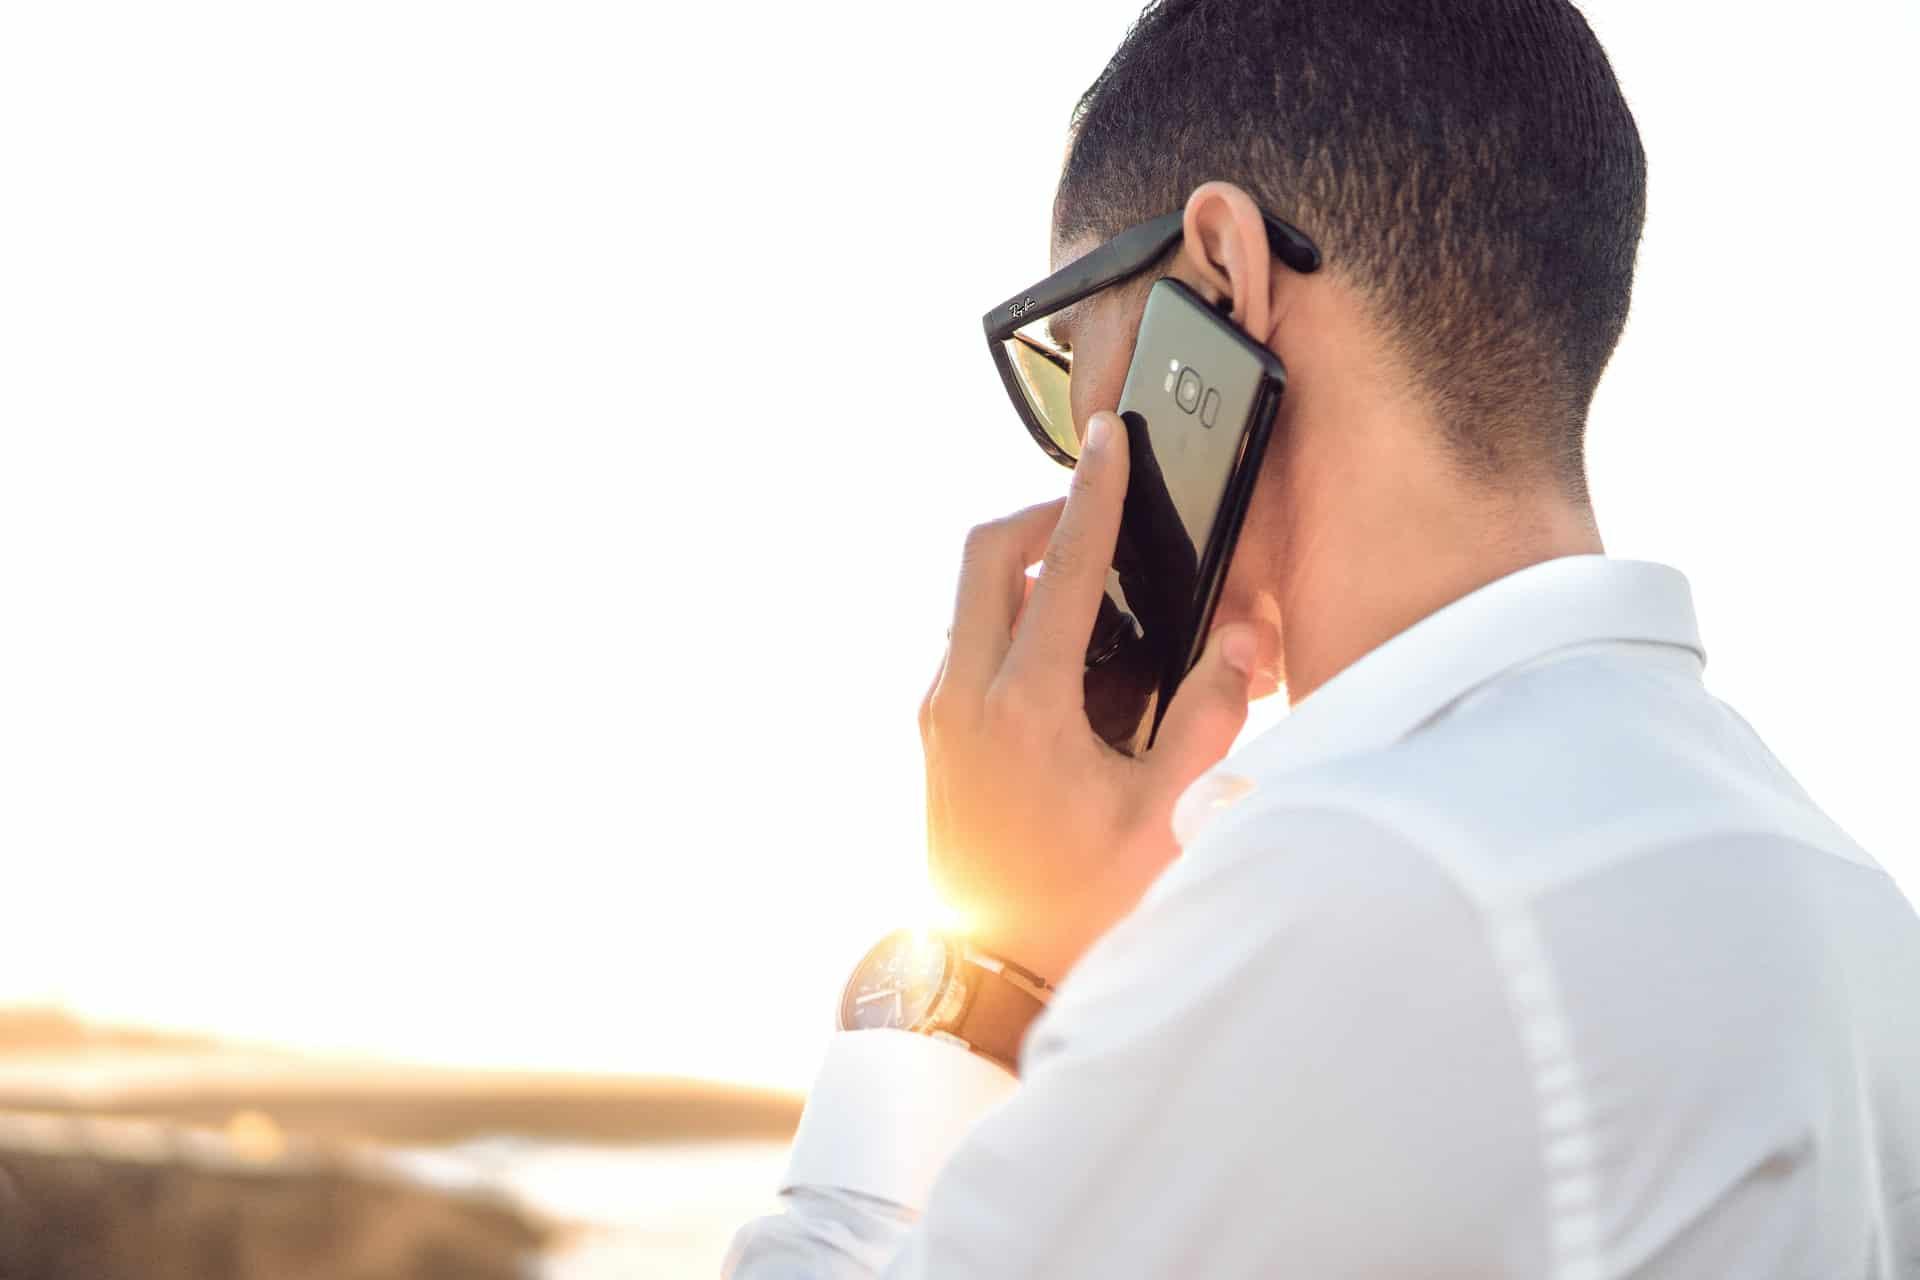 Mladý muž telefonuje na slunci